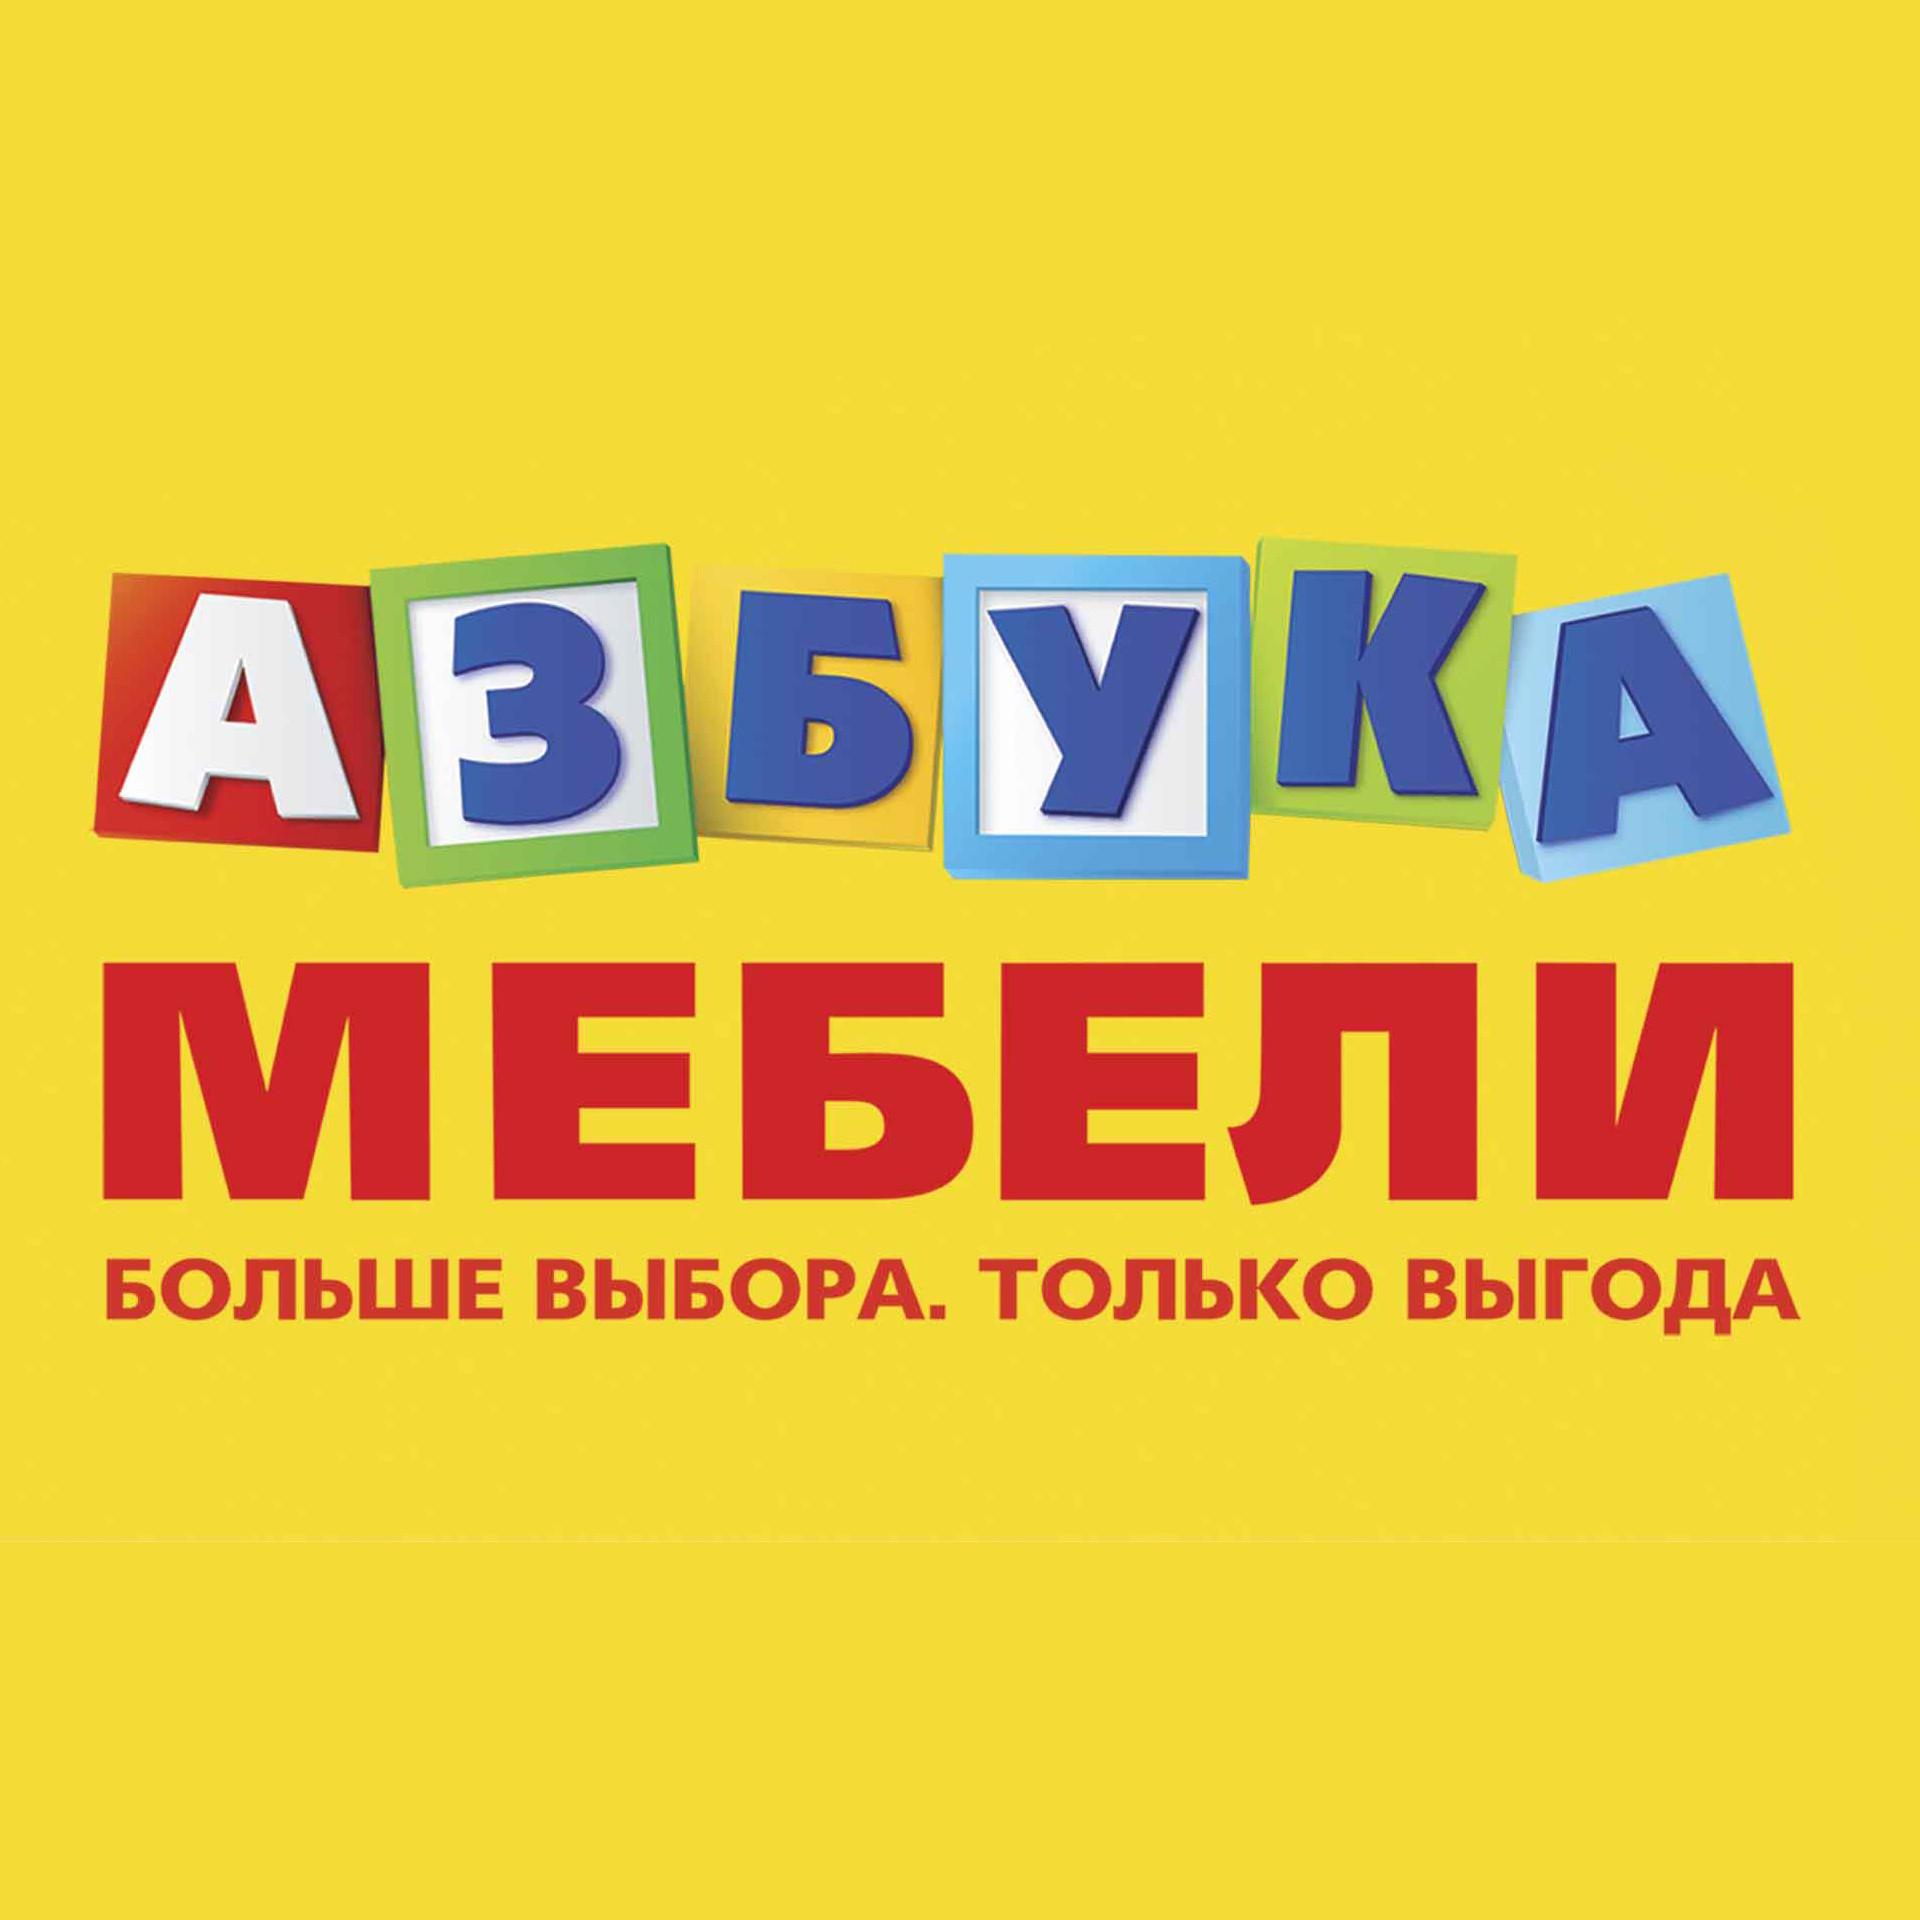 Азбука Мебели Хабаровск Интернет Магазин Каталог